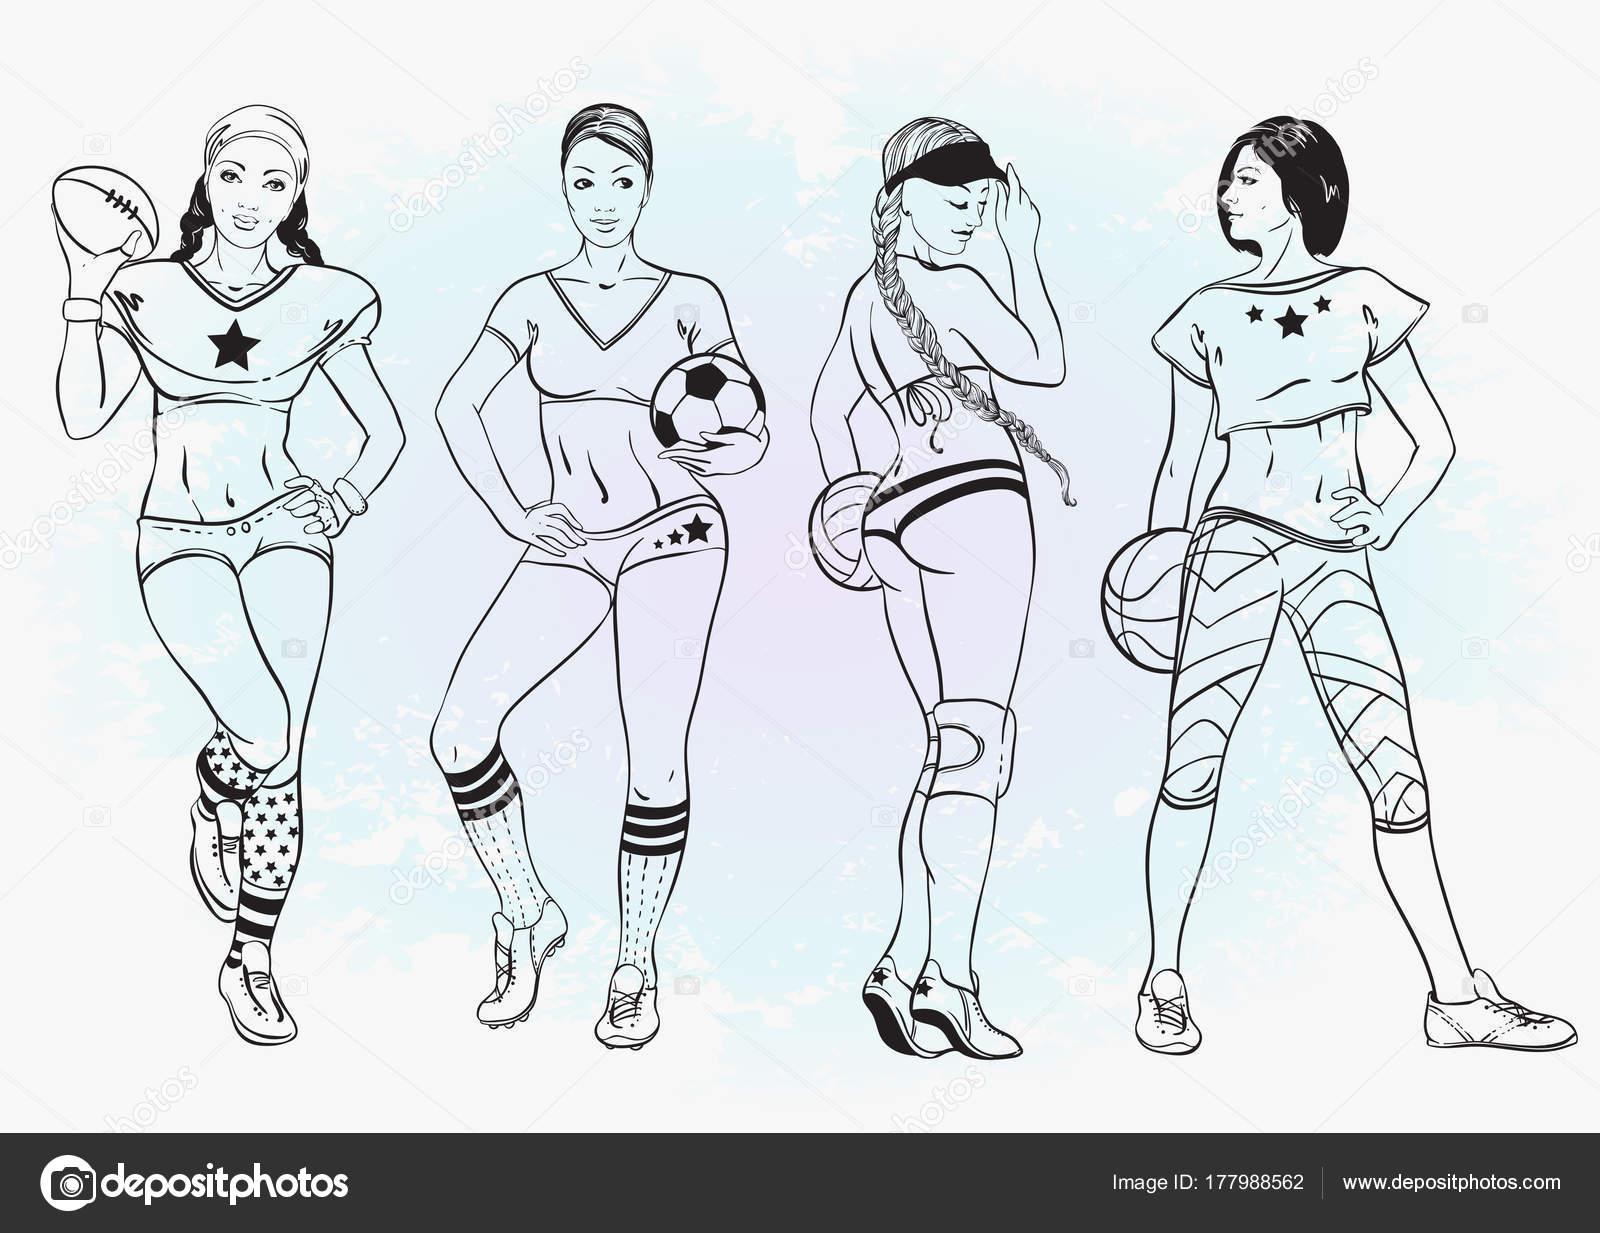 Fotos Chicas Para Dibujar Deportes Para Colorear Libro